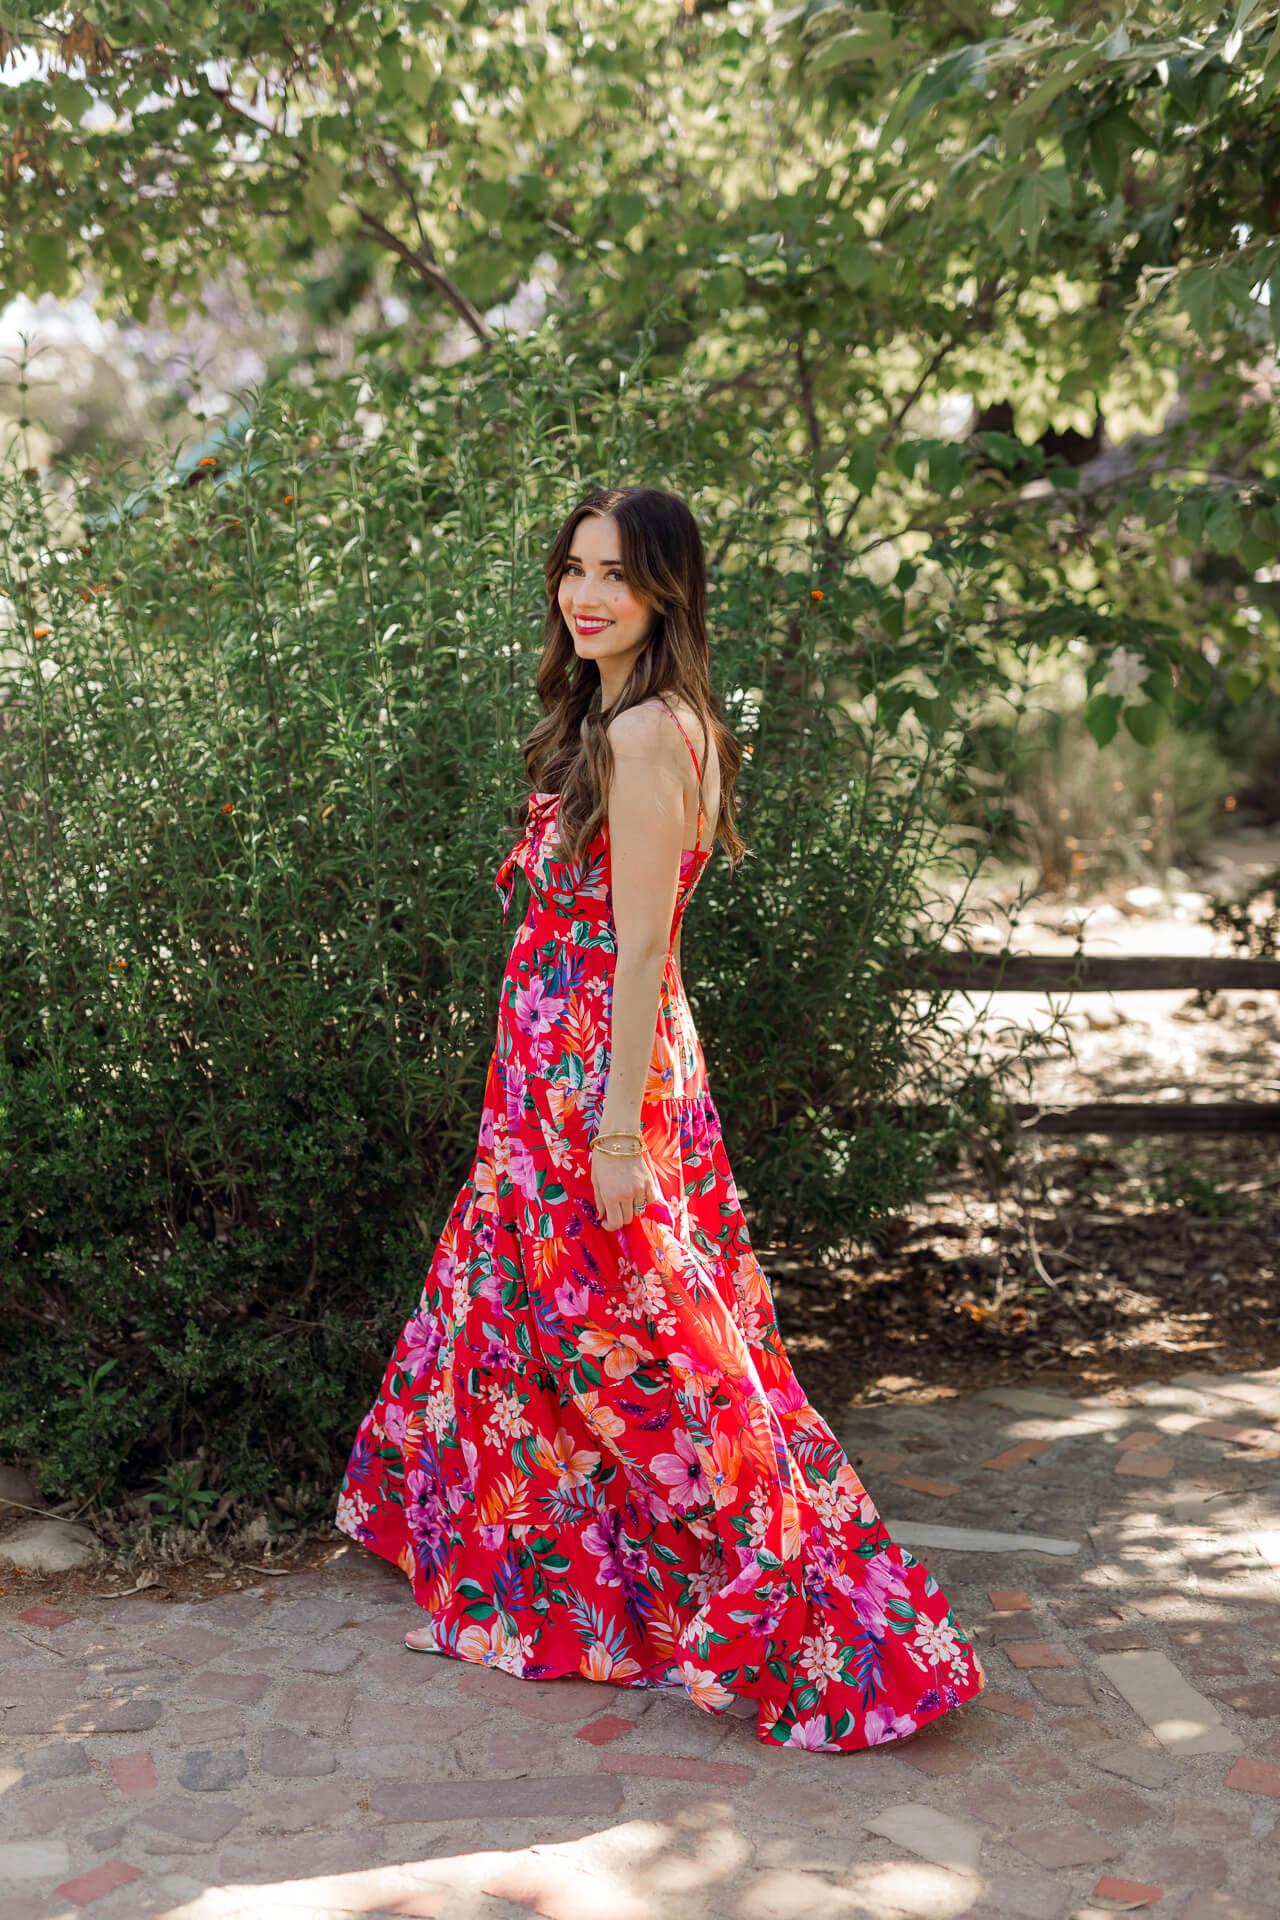 Tropical print maxi dresses for summer! - M Loves M